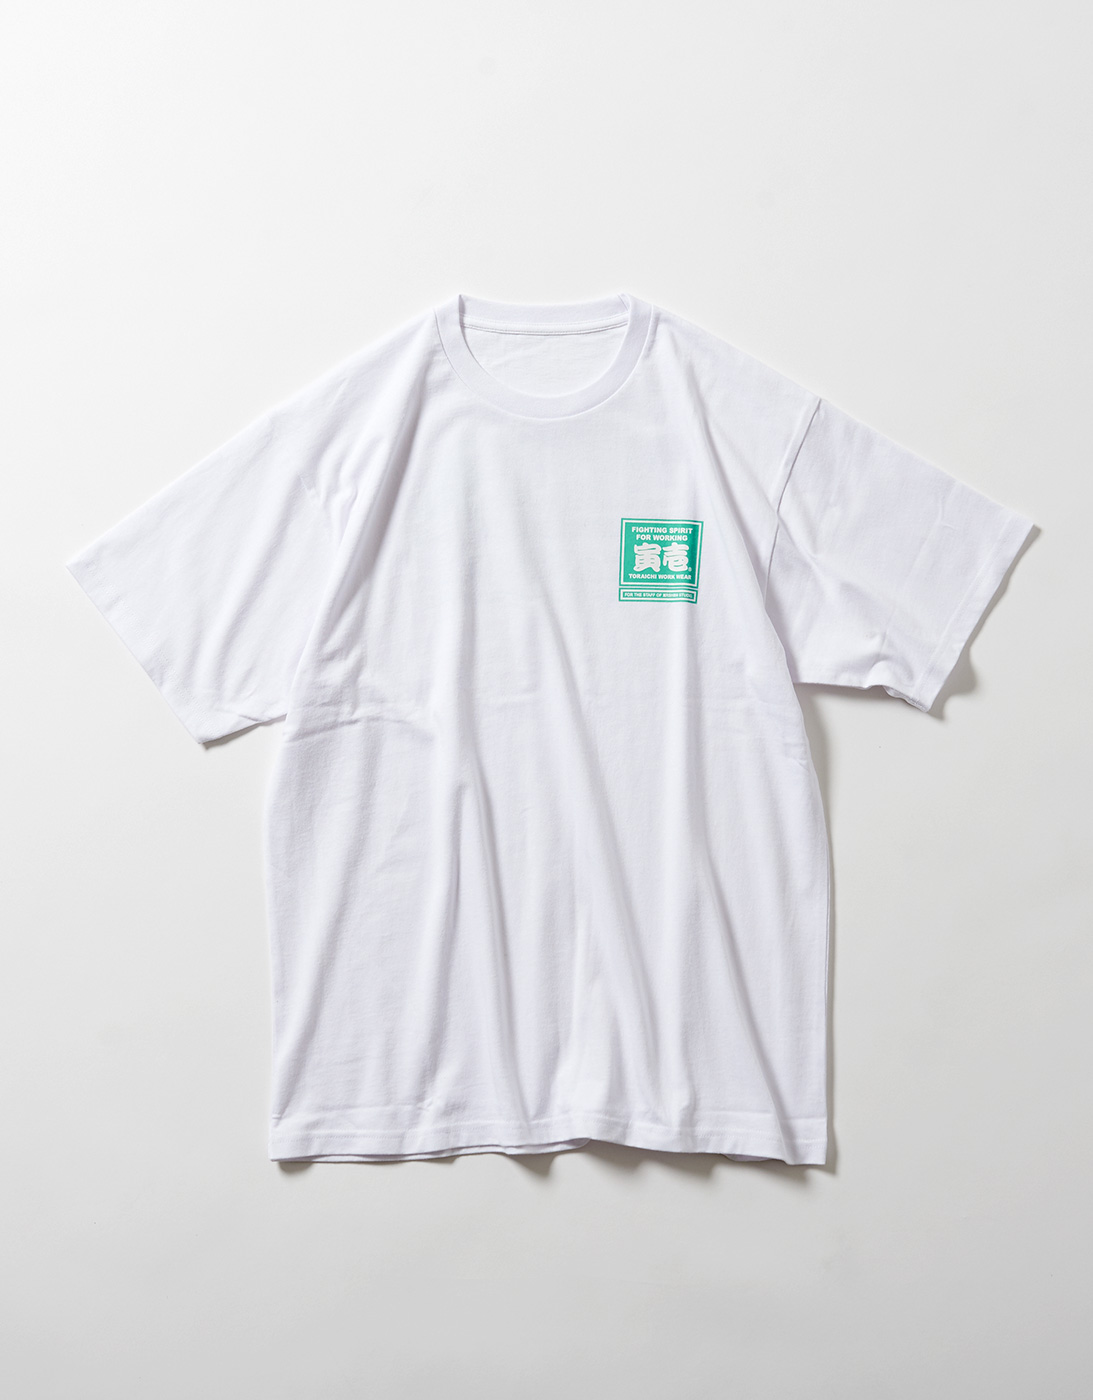 TORA LOGO WORK T-shirts for THE STAFF of ARSHAM STUDIO 1807-618 WHITE